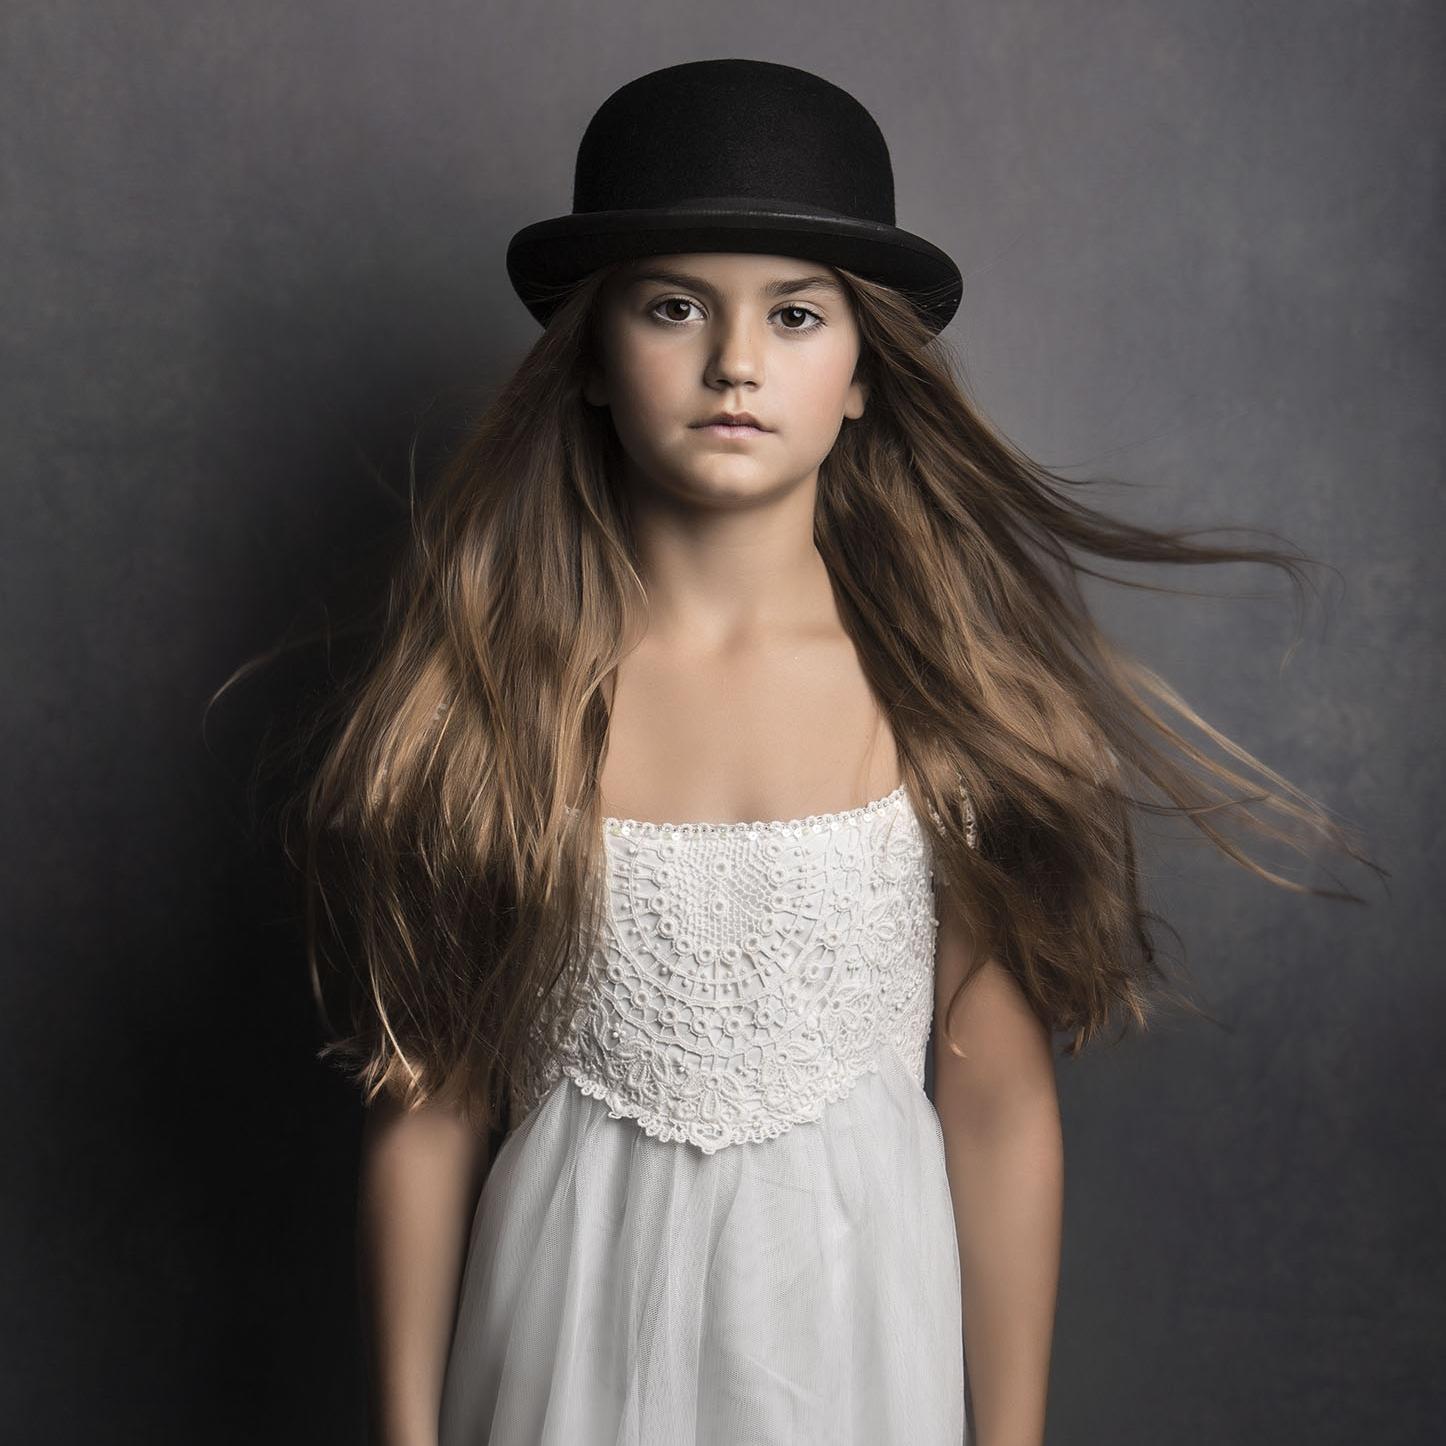 elizabethgphotography_kingslangley_hertfordshire_fineart_childrens_photography_37.jpg